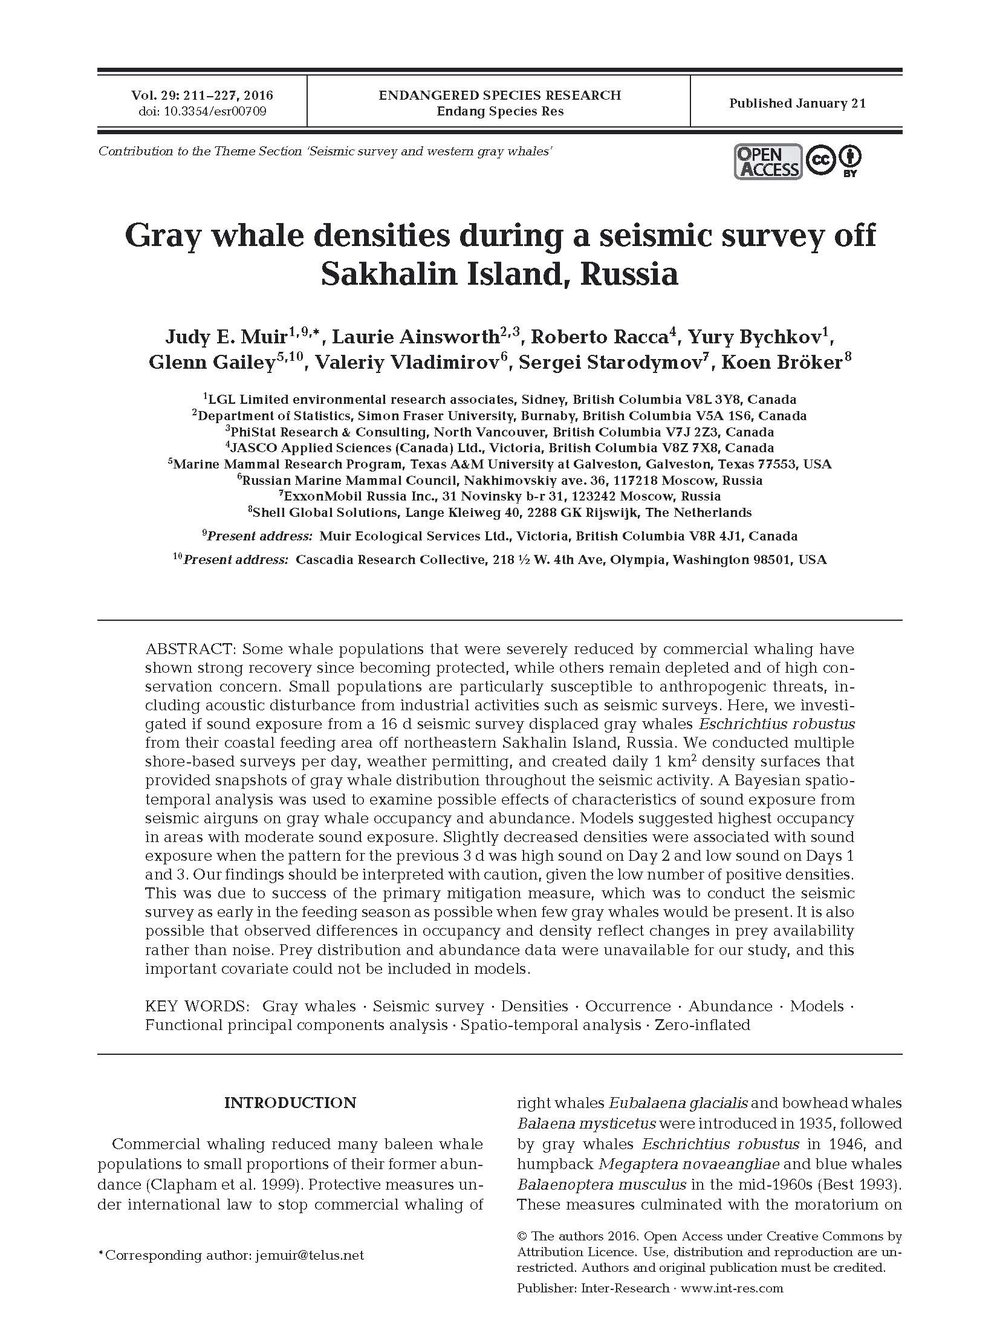 Gray whale densities during a seismic survey off Sakhalin Island, Russia - Muir, J.E., L. Ainsworth, R. Racca, Y. Bychkov, G. Gailey, V. Vladimirov, S. Starodymov, and K. BrökerEndang. Species Res. 29: 211-227 (2016)doi.org/10.3354/esr00709